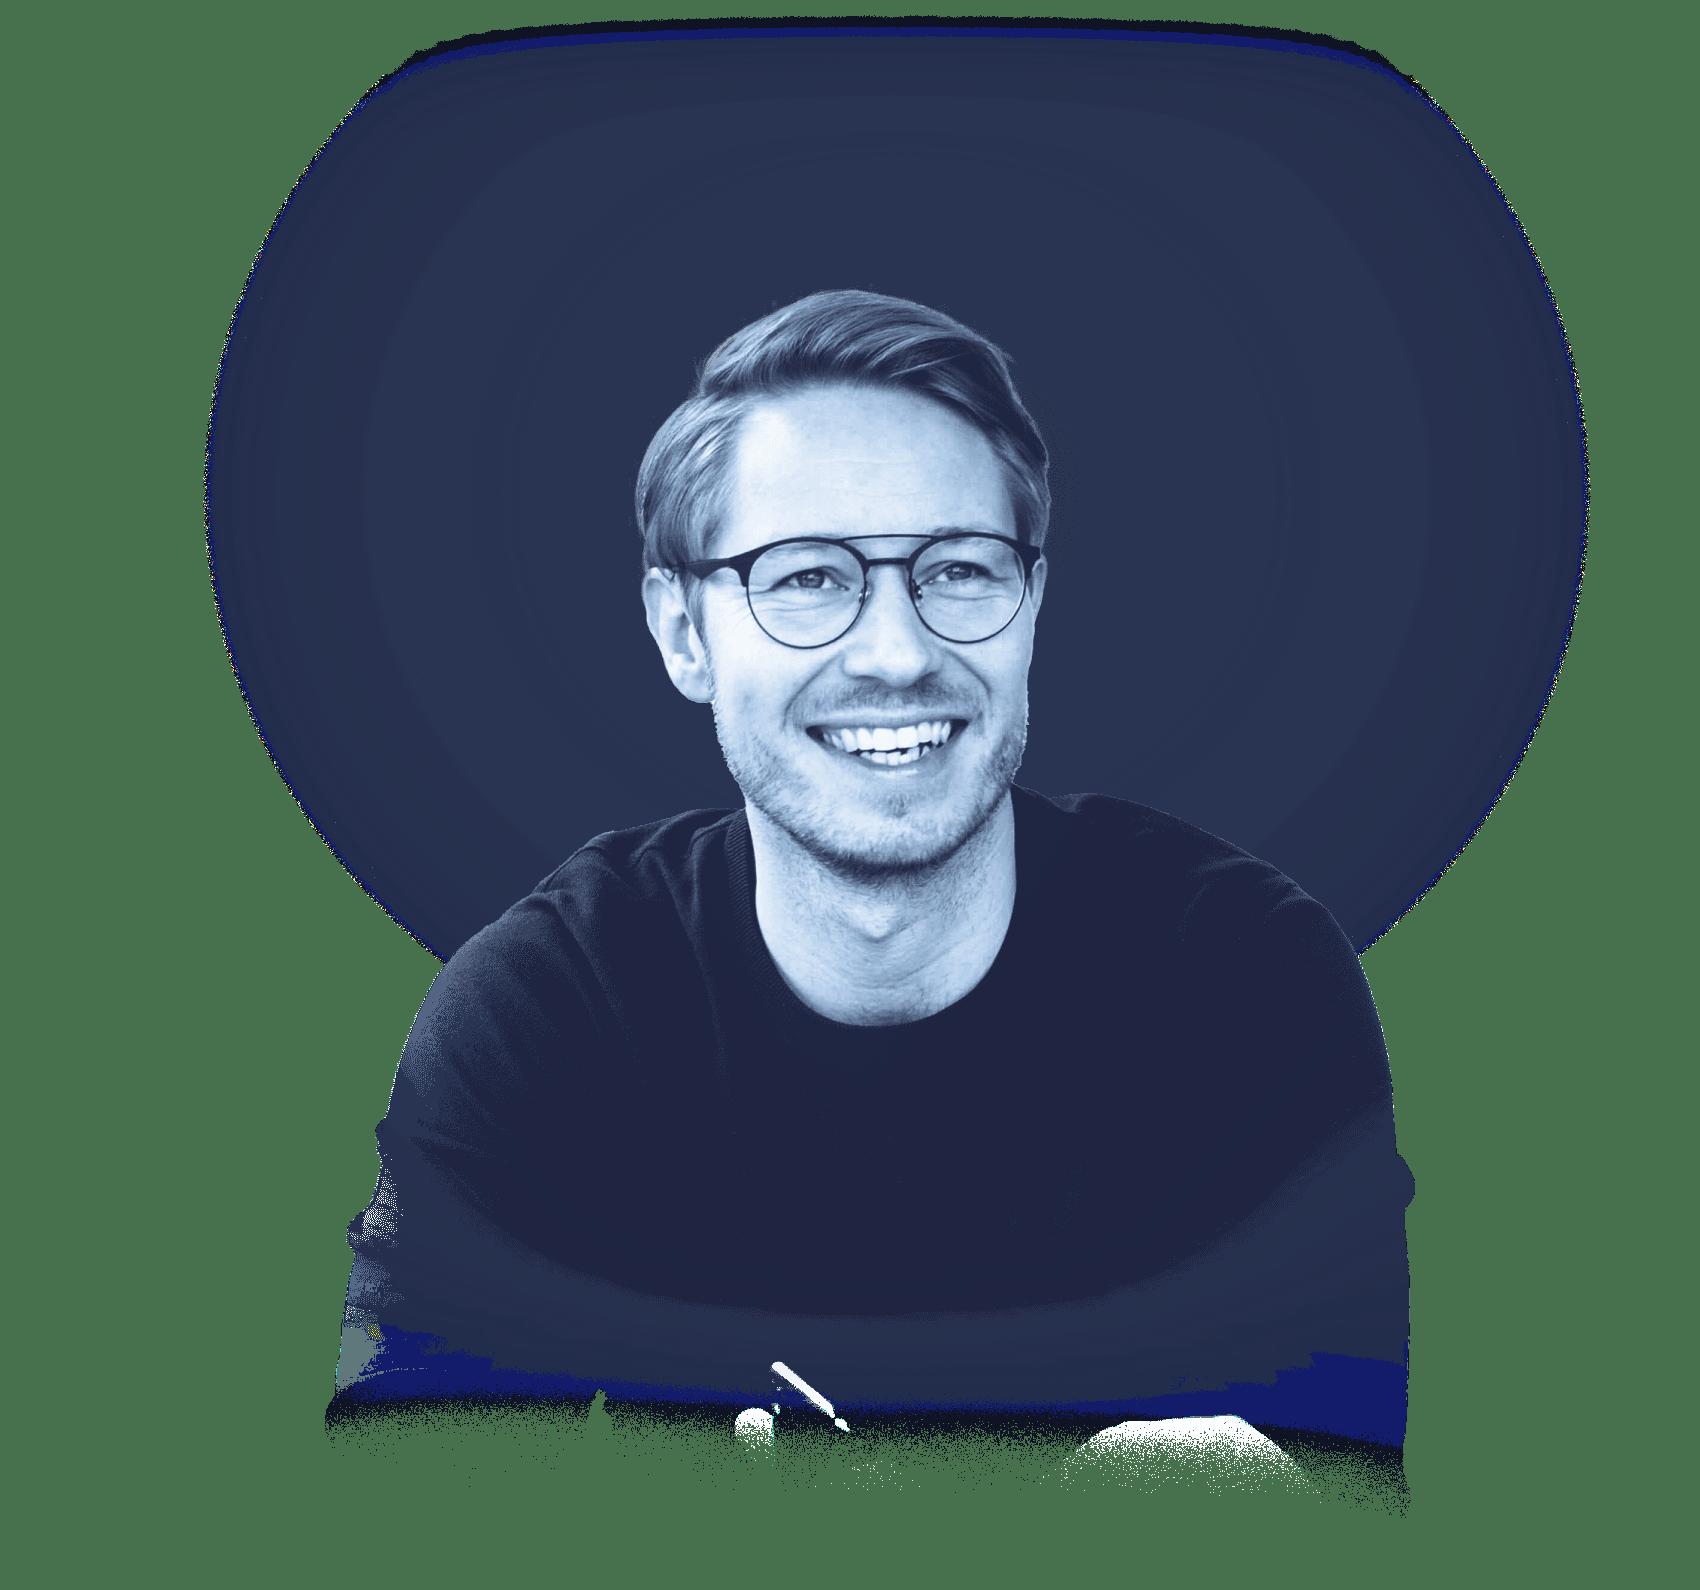 Niels Martin Brøchner